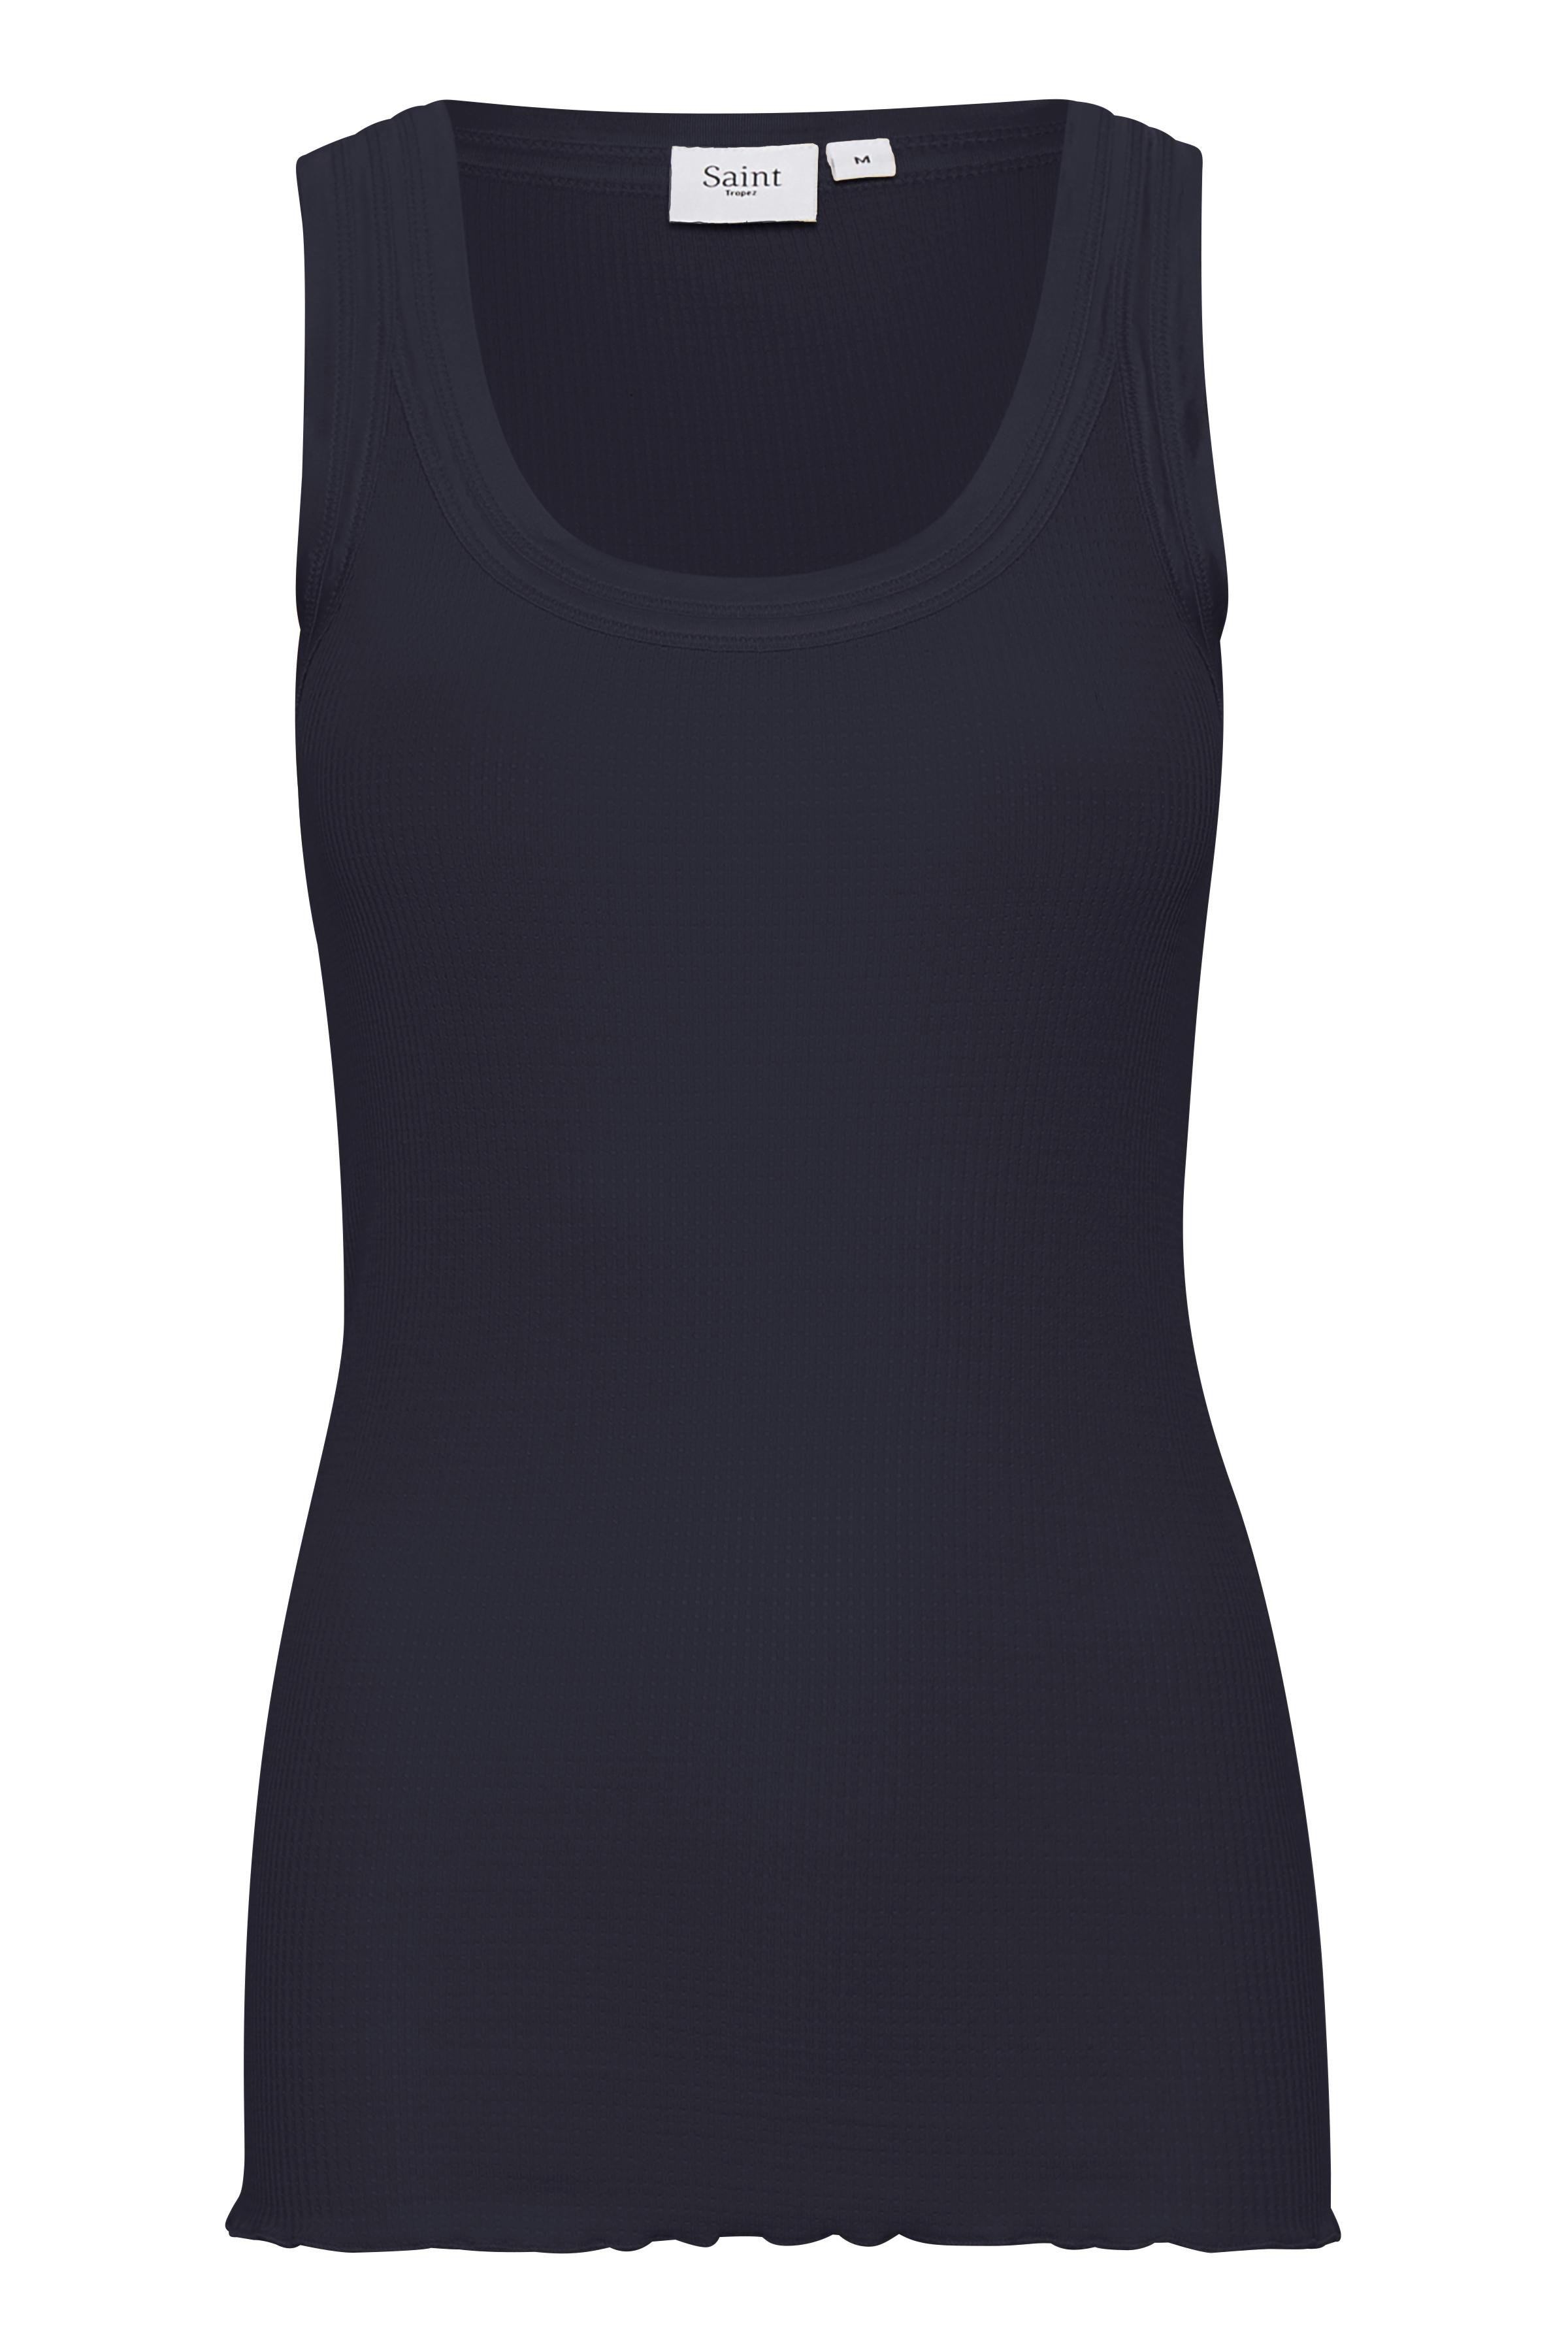 Image of Saint Tropez Dame Top - Mørkeblå